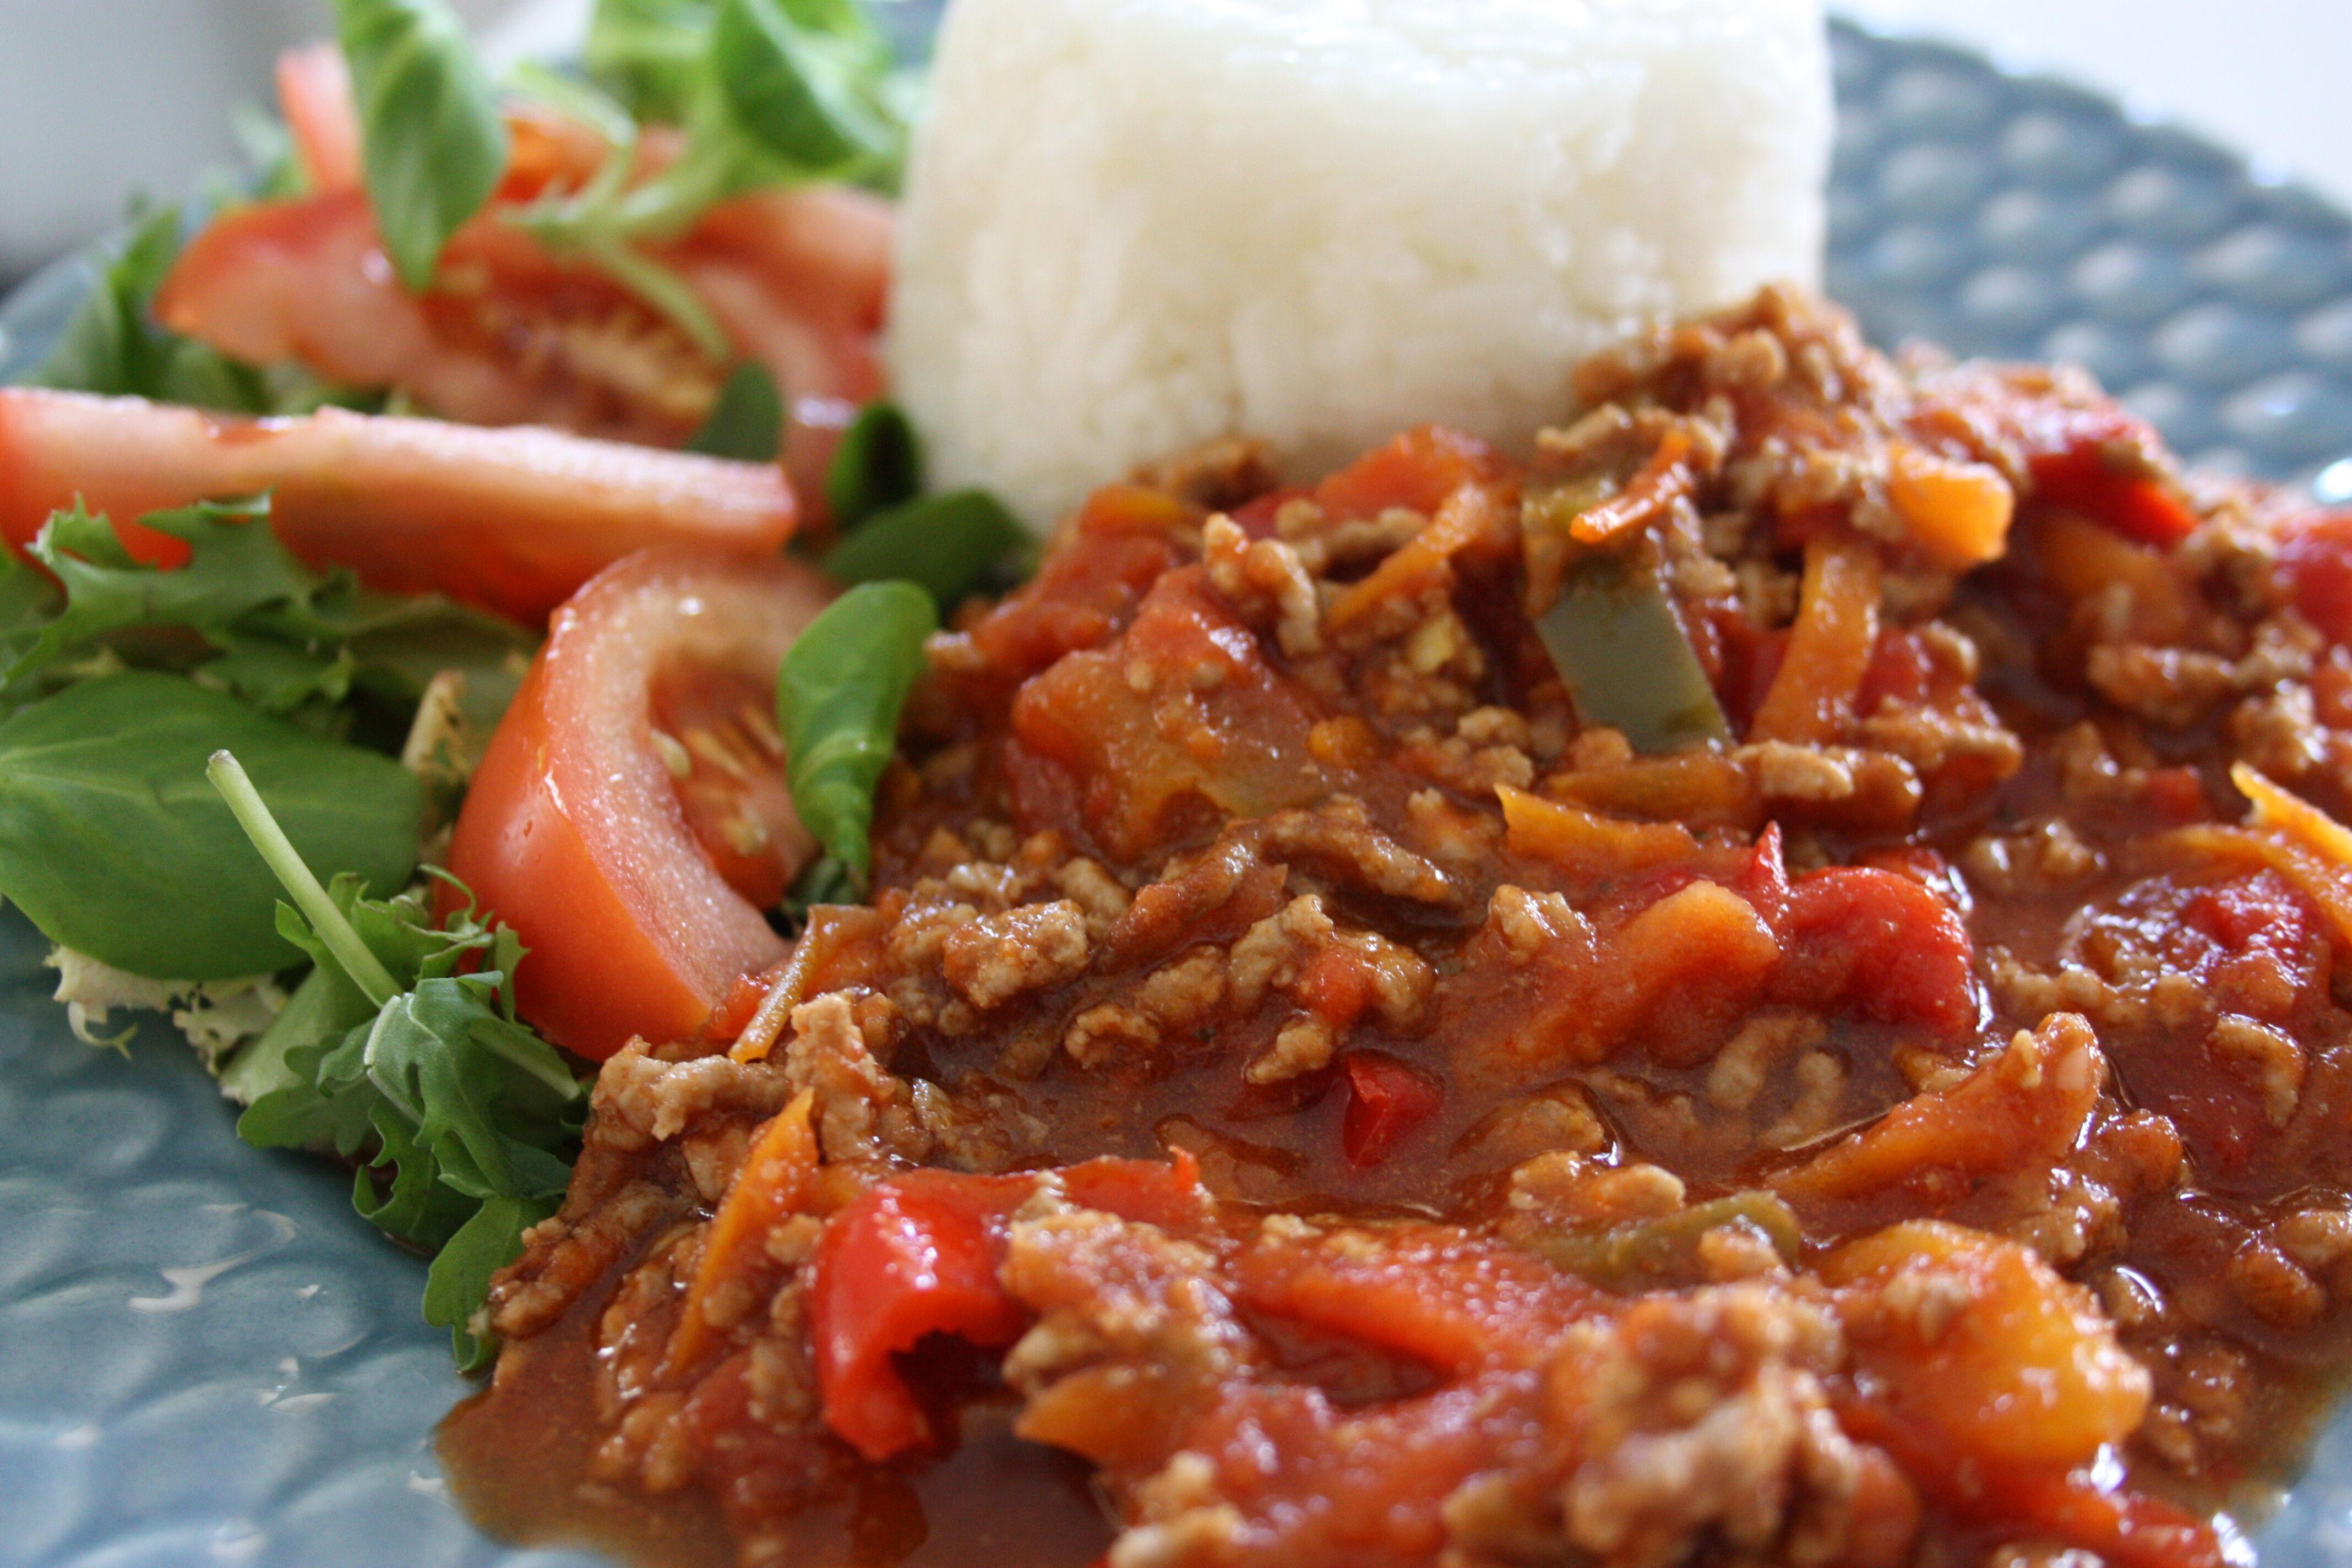 billig köttfärssås